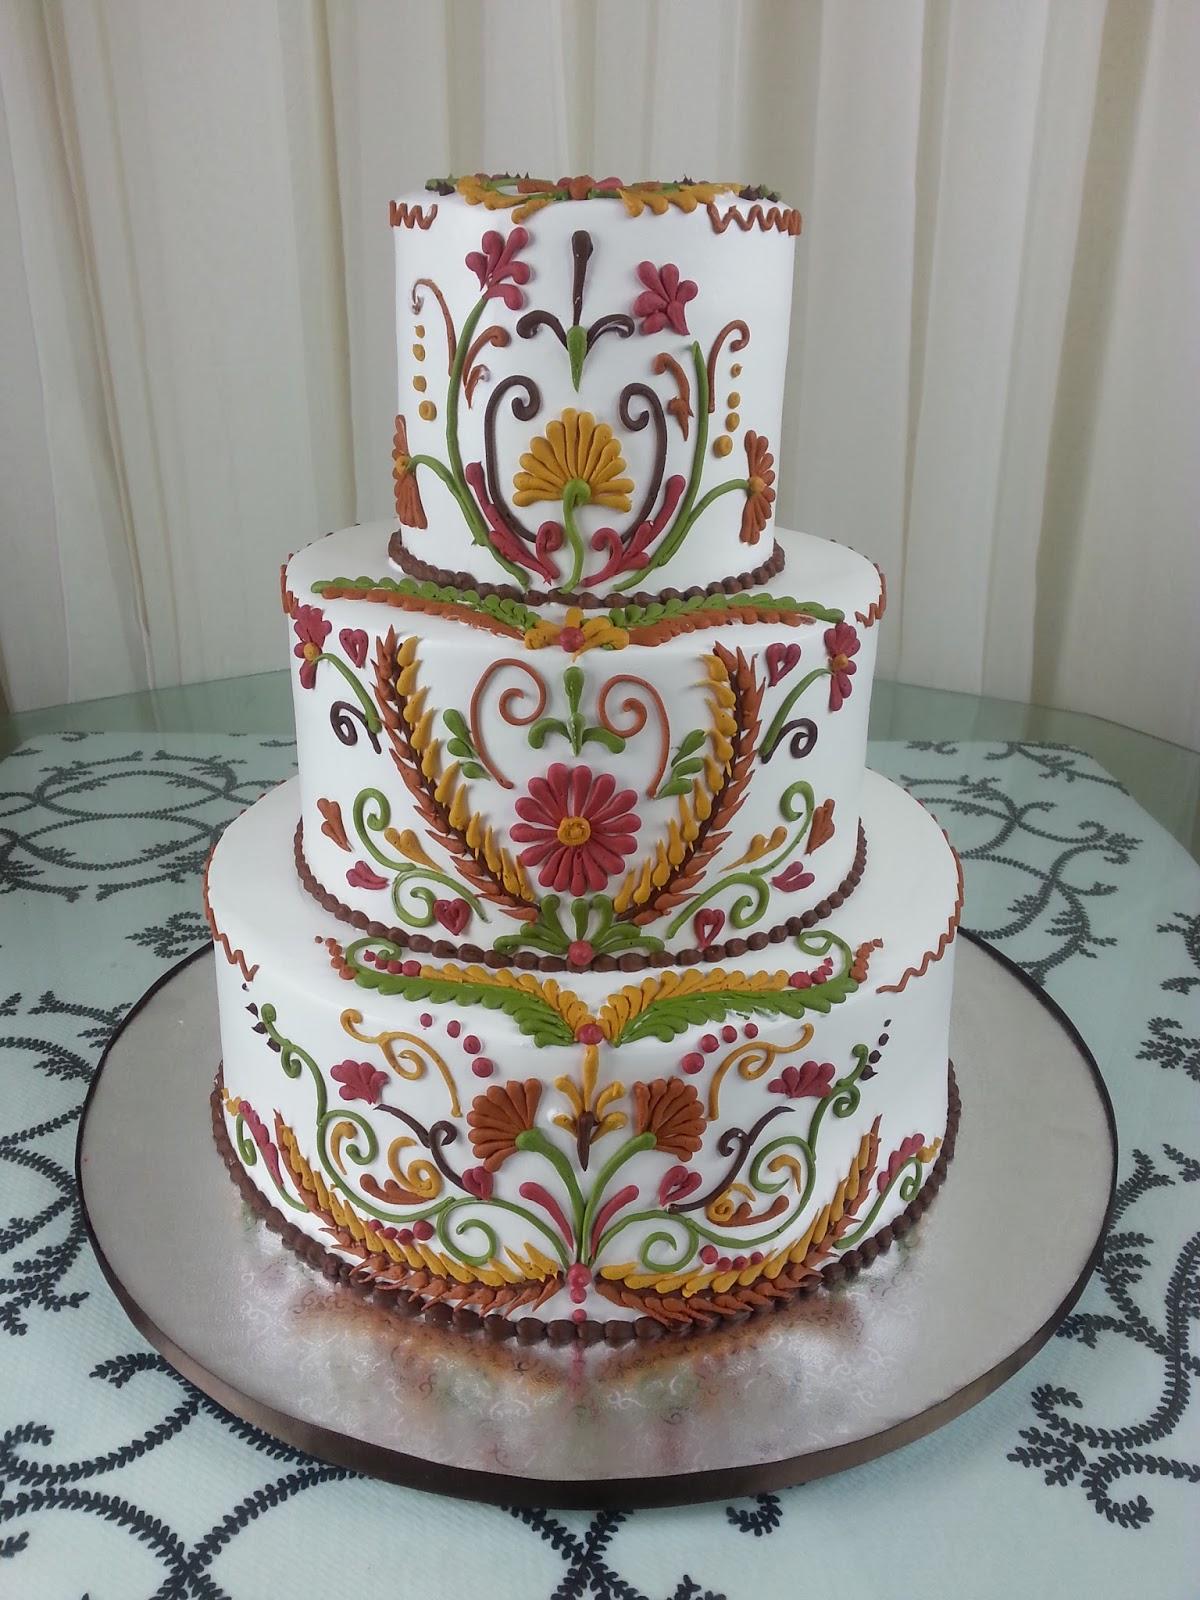 Best German Chocolate Cake In Phoenix